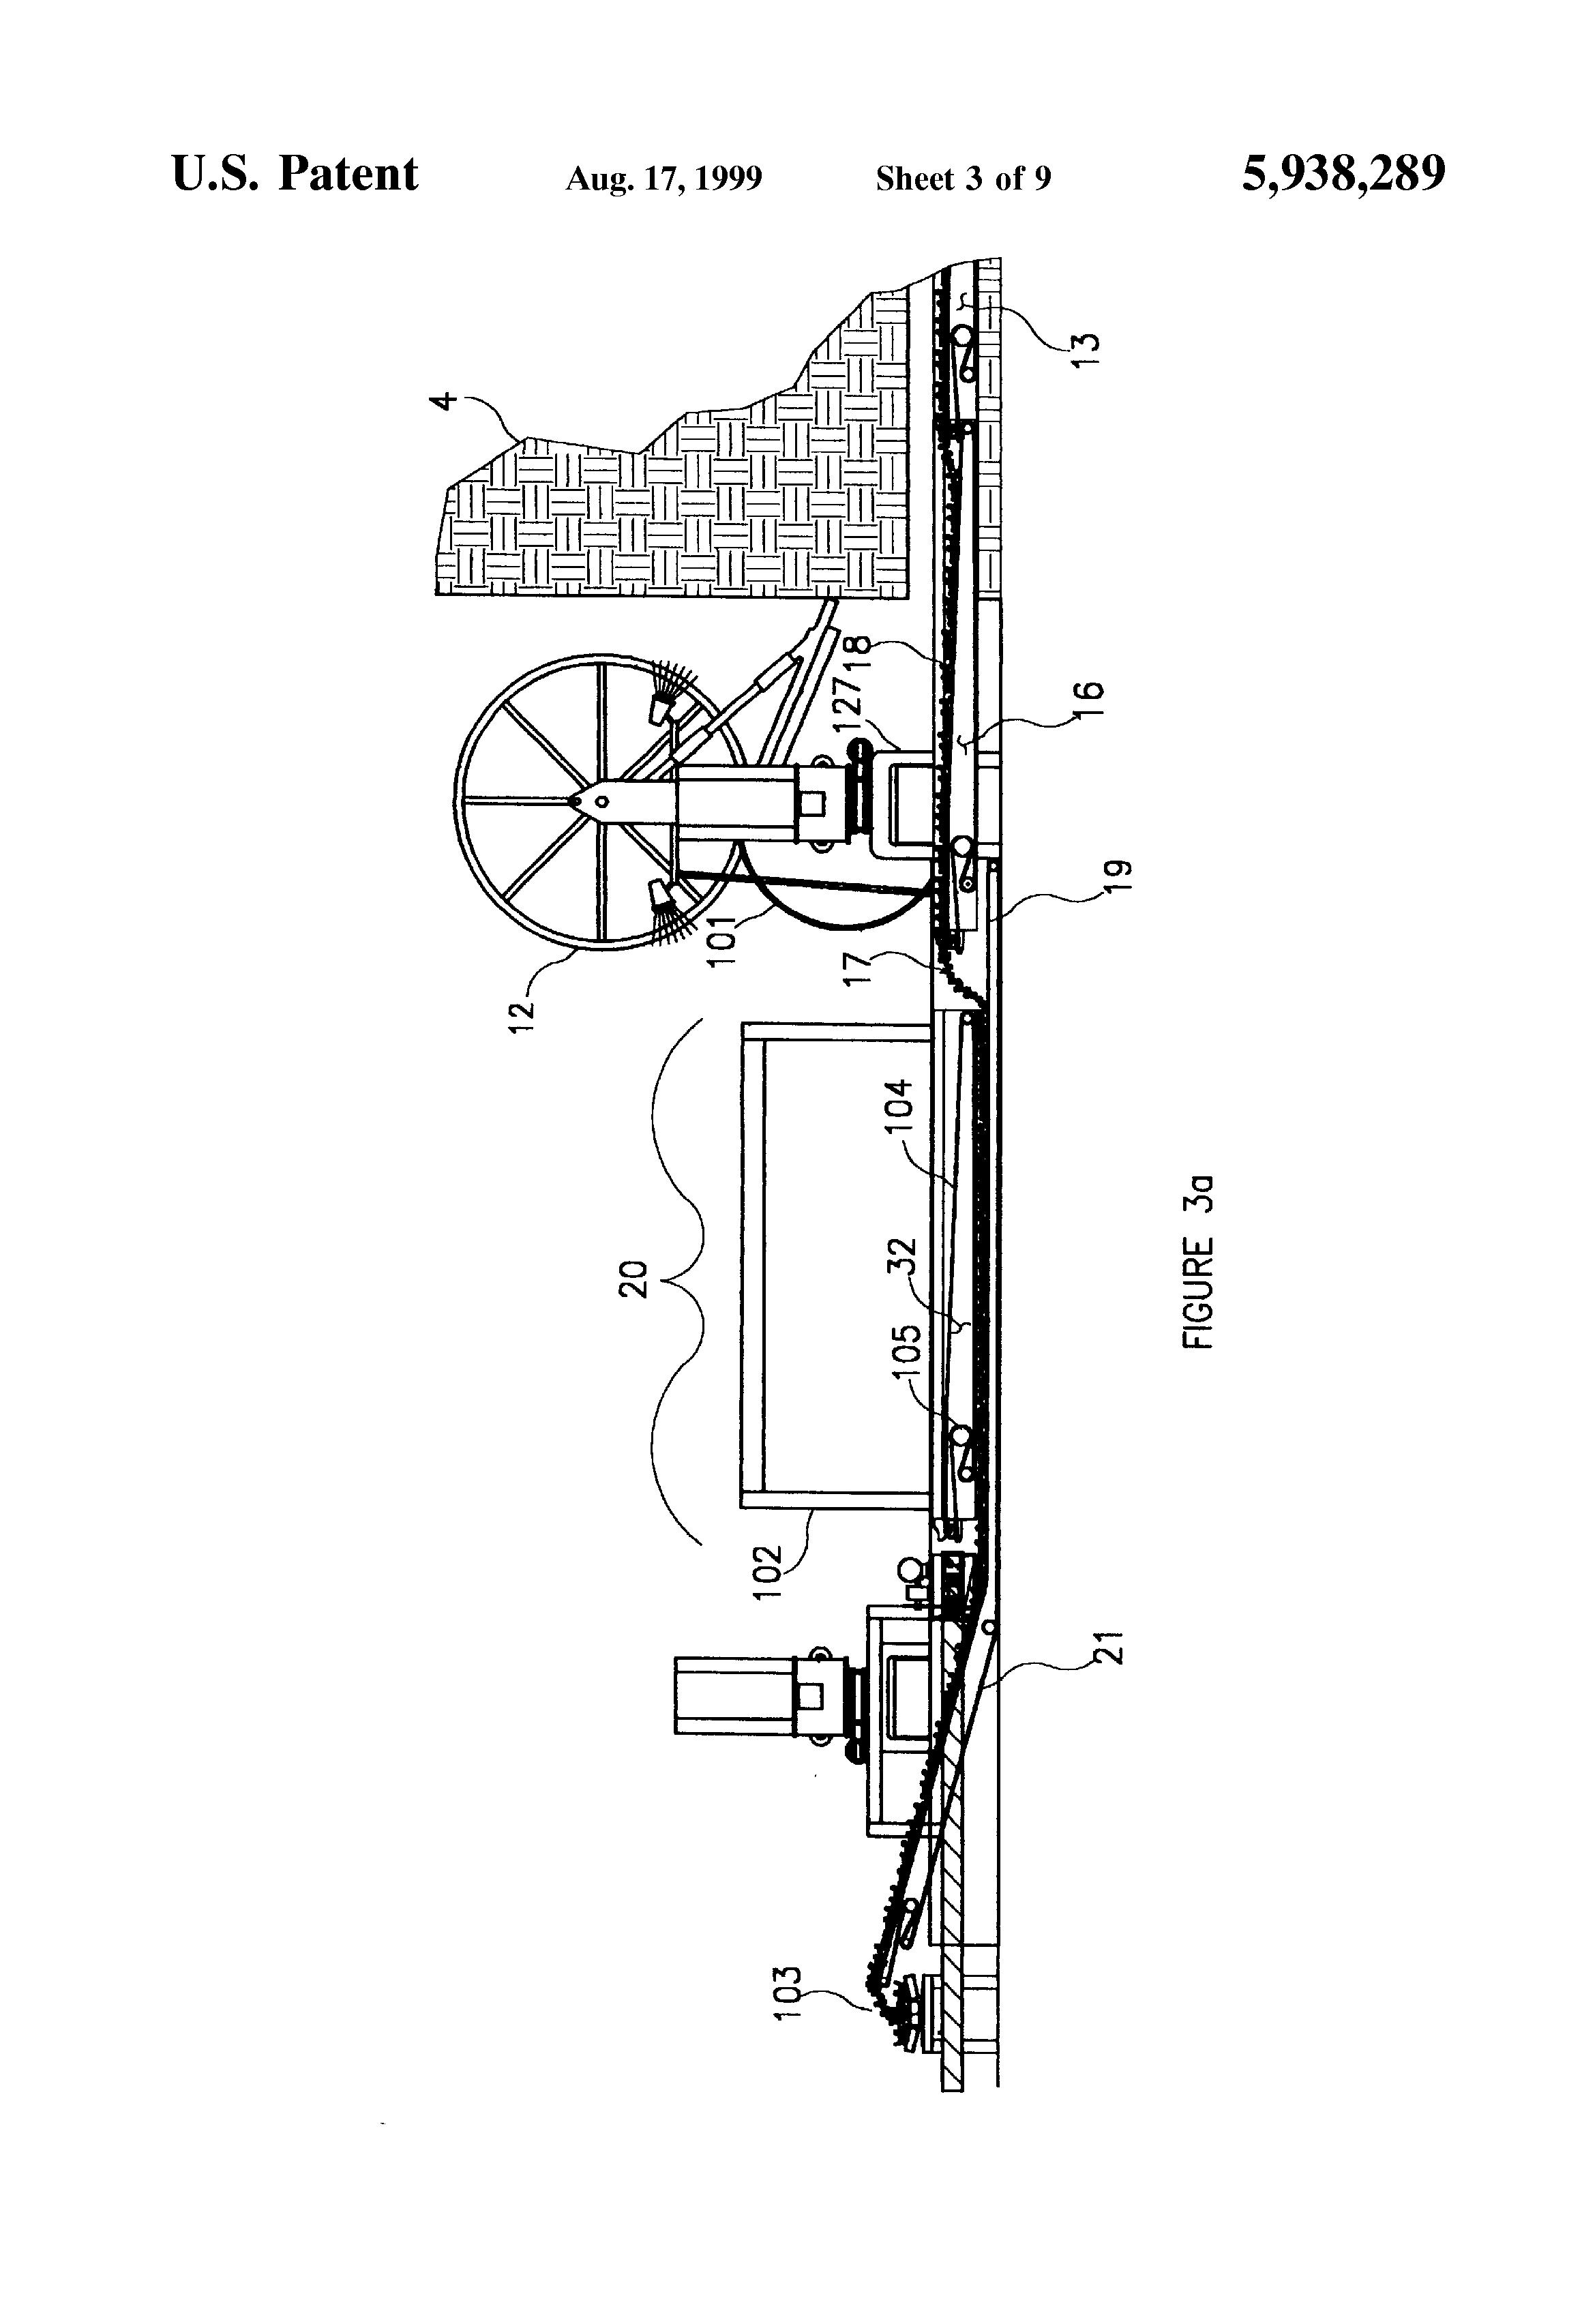 mining conveyor section diagram diagrams auto parts auto mobile engine parts valve diagram